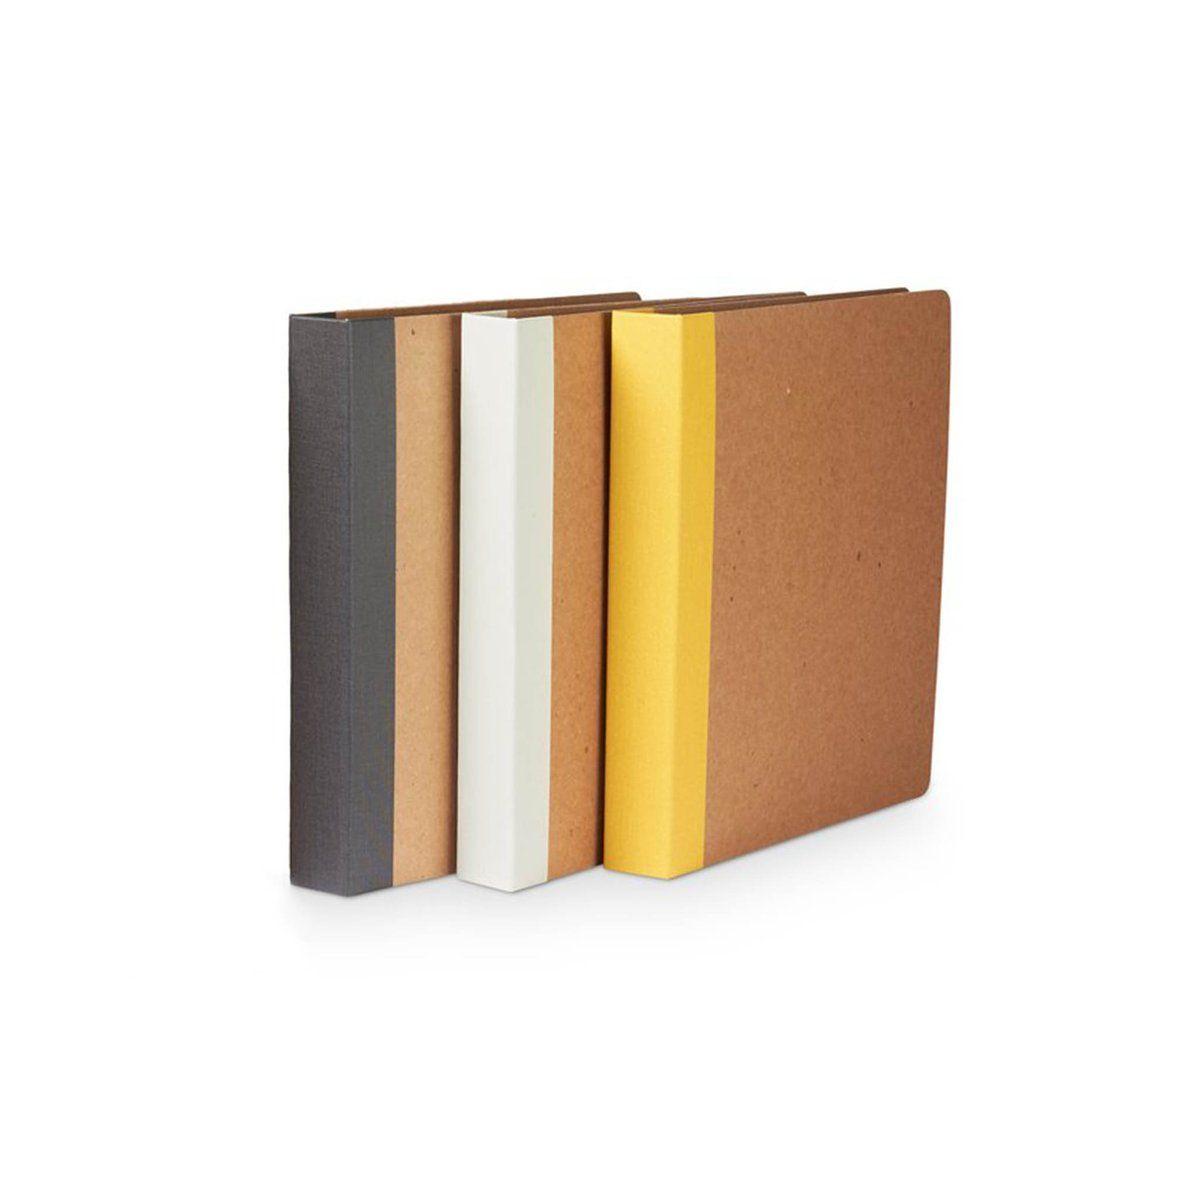 Cardboard Recycling, Binder Covers, Binder